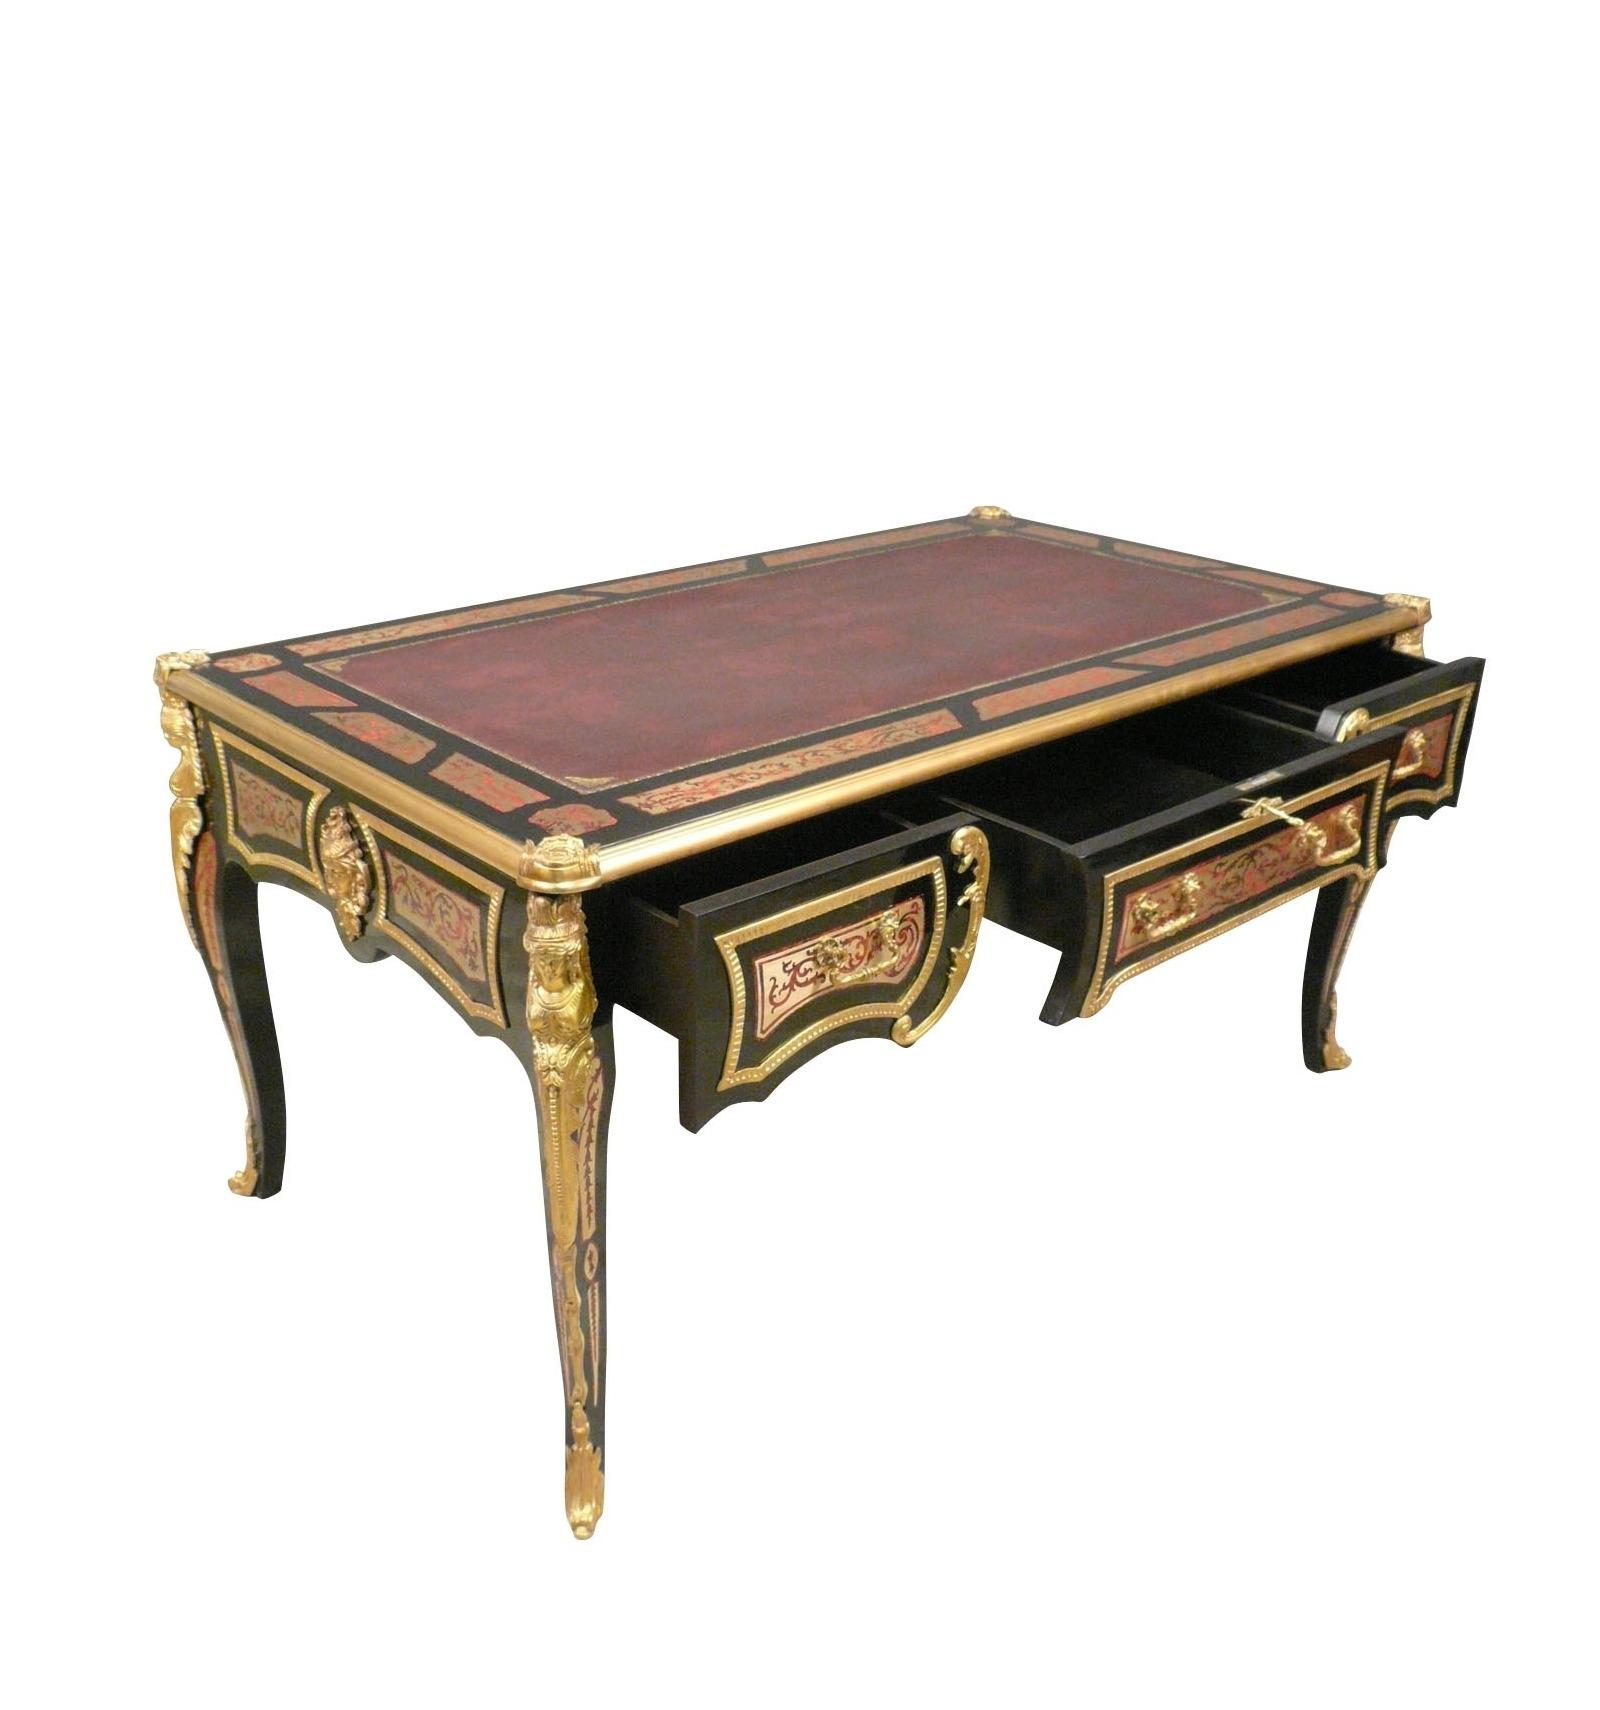 Scrivania luigi xv mobili in stile e art dec - Luigi xv mobili ...